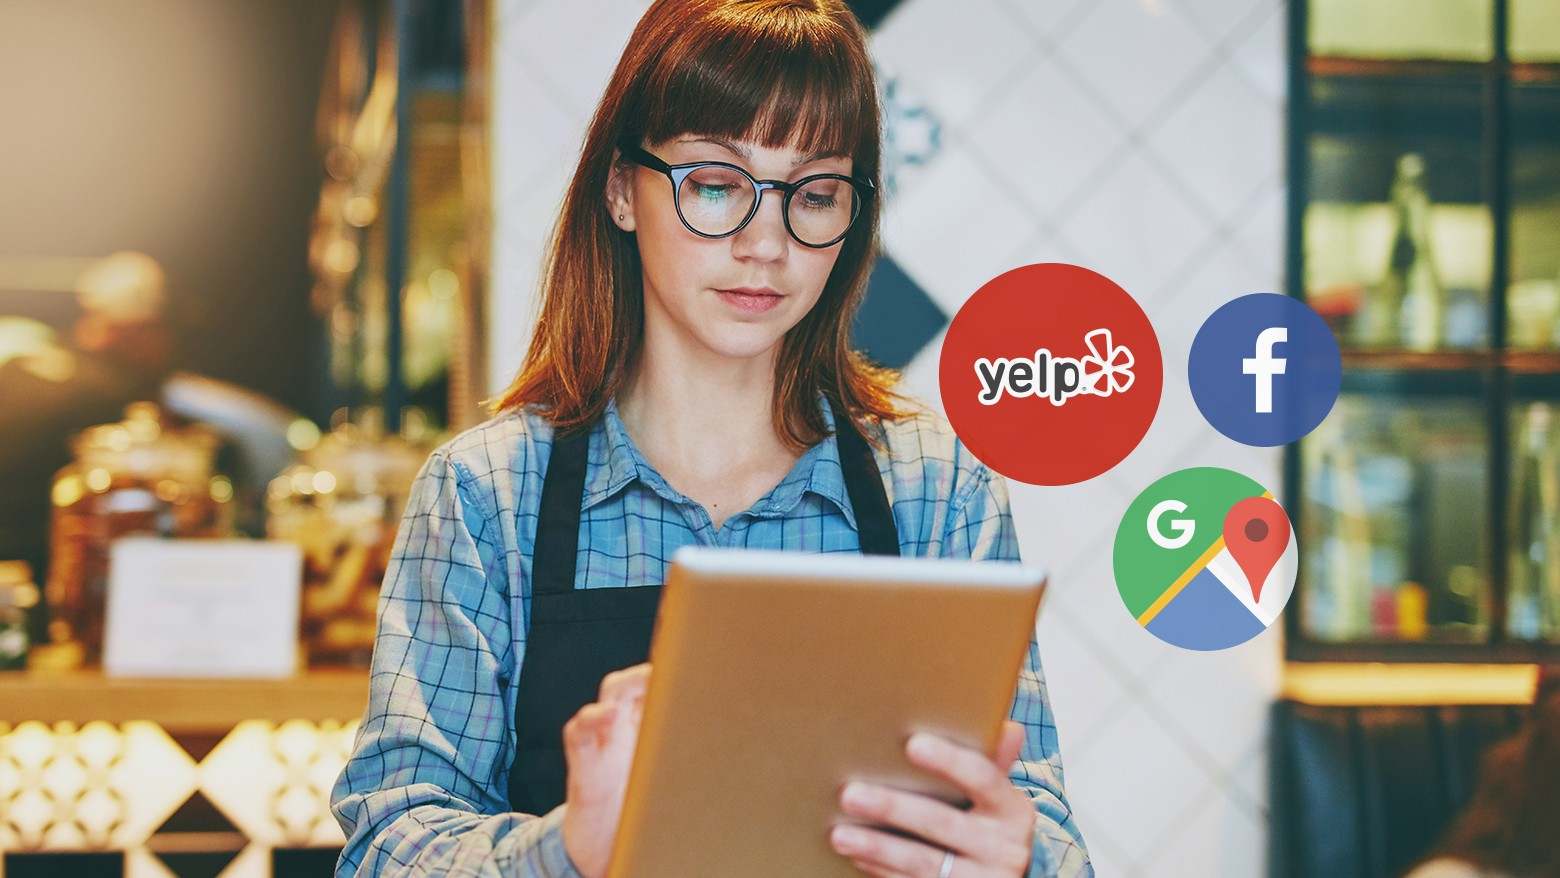 GoogleMaps-Yelp-Reviews_1560x878